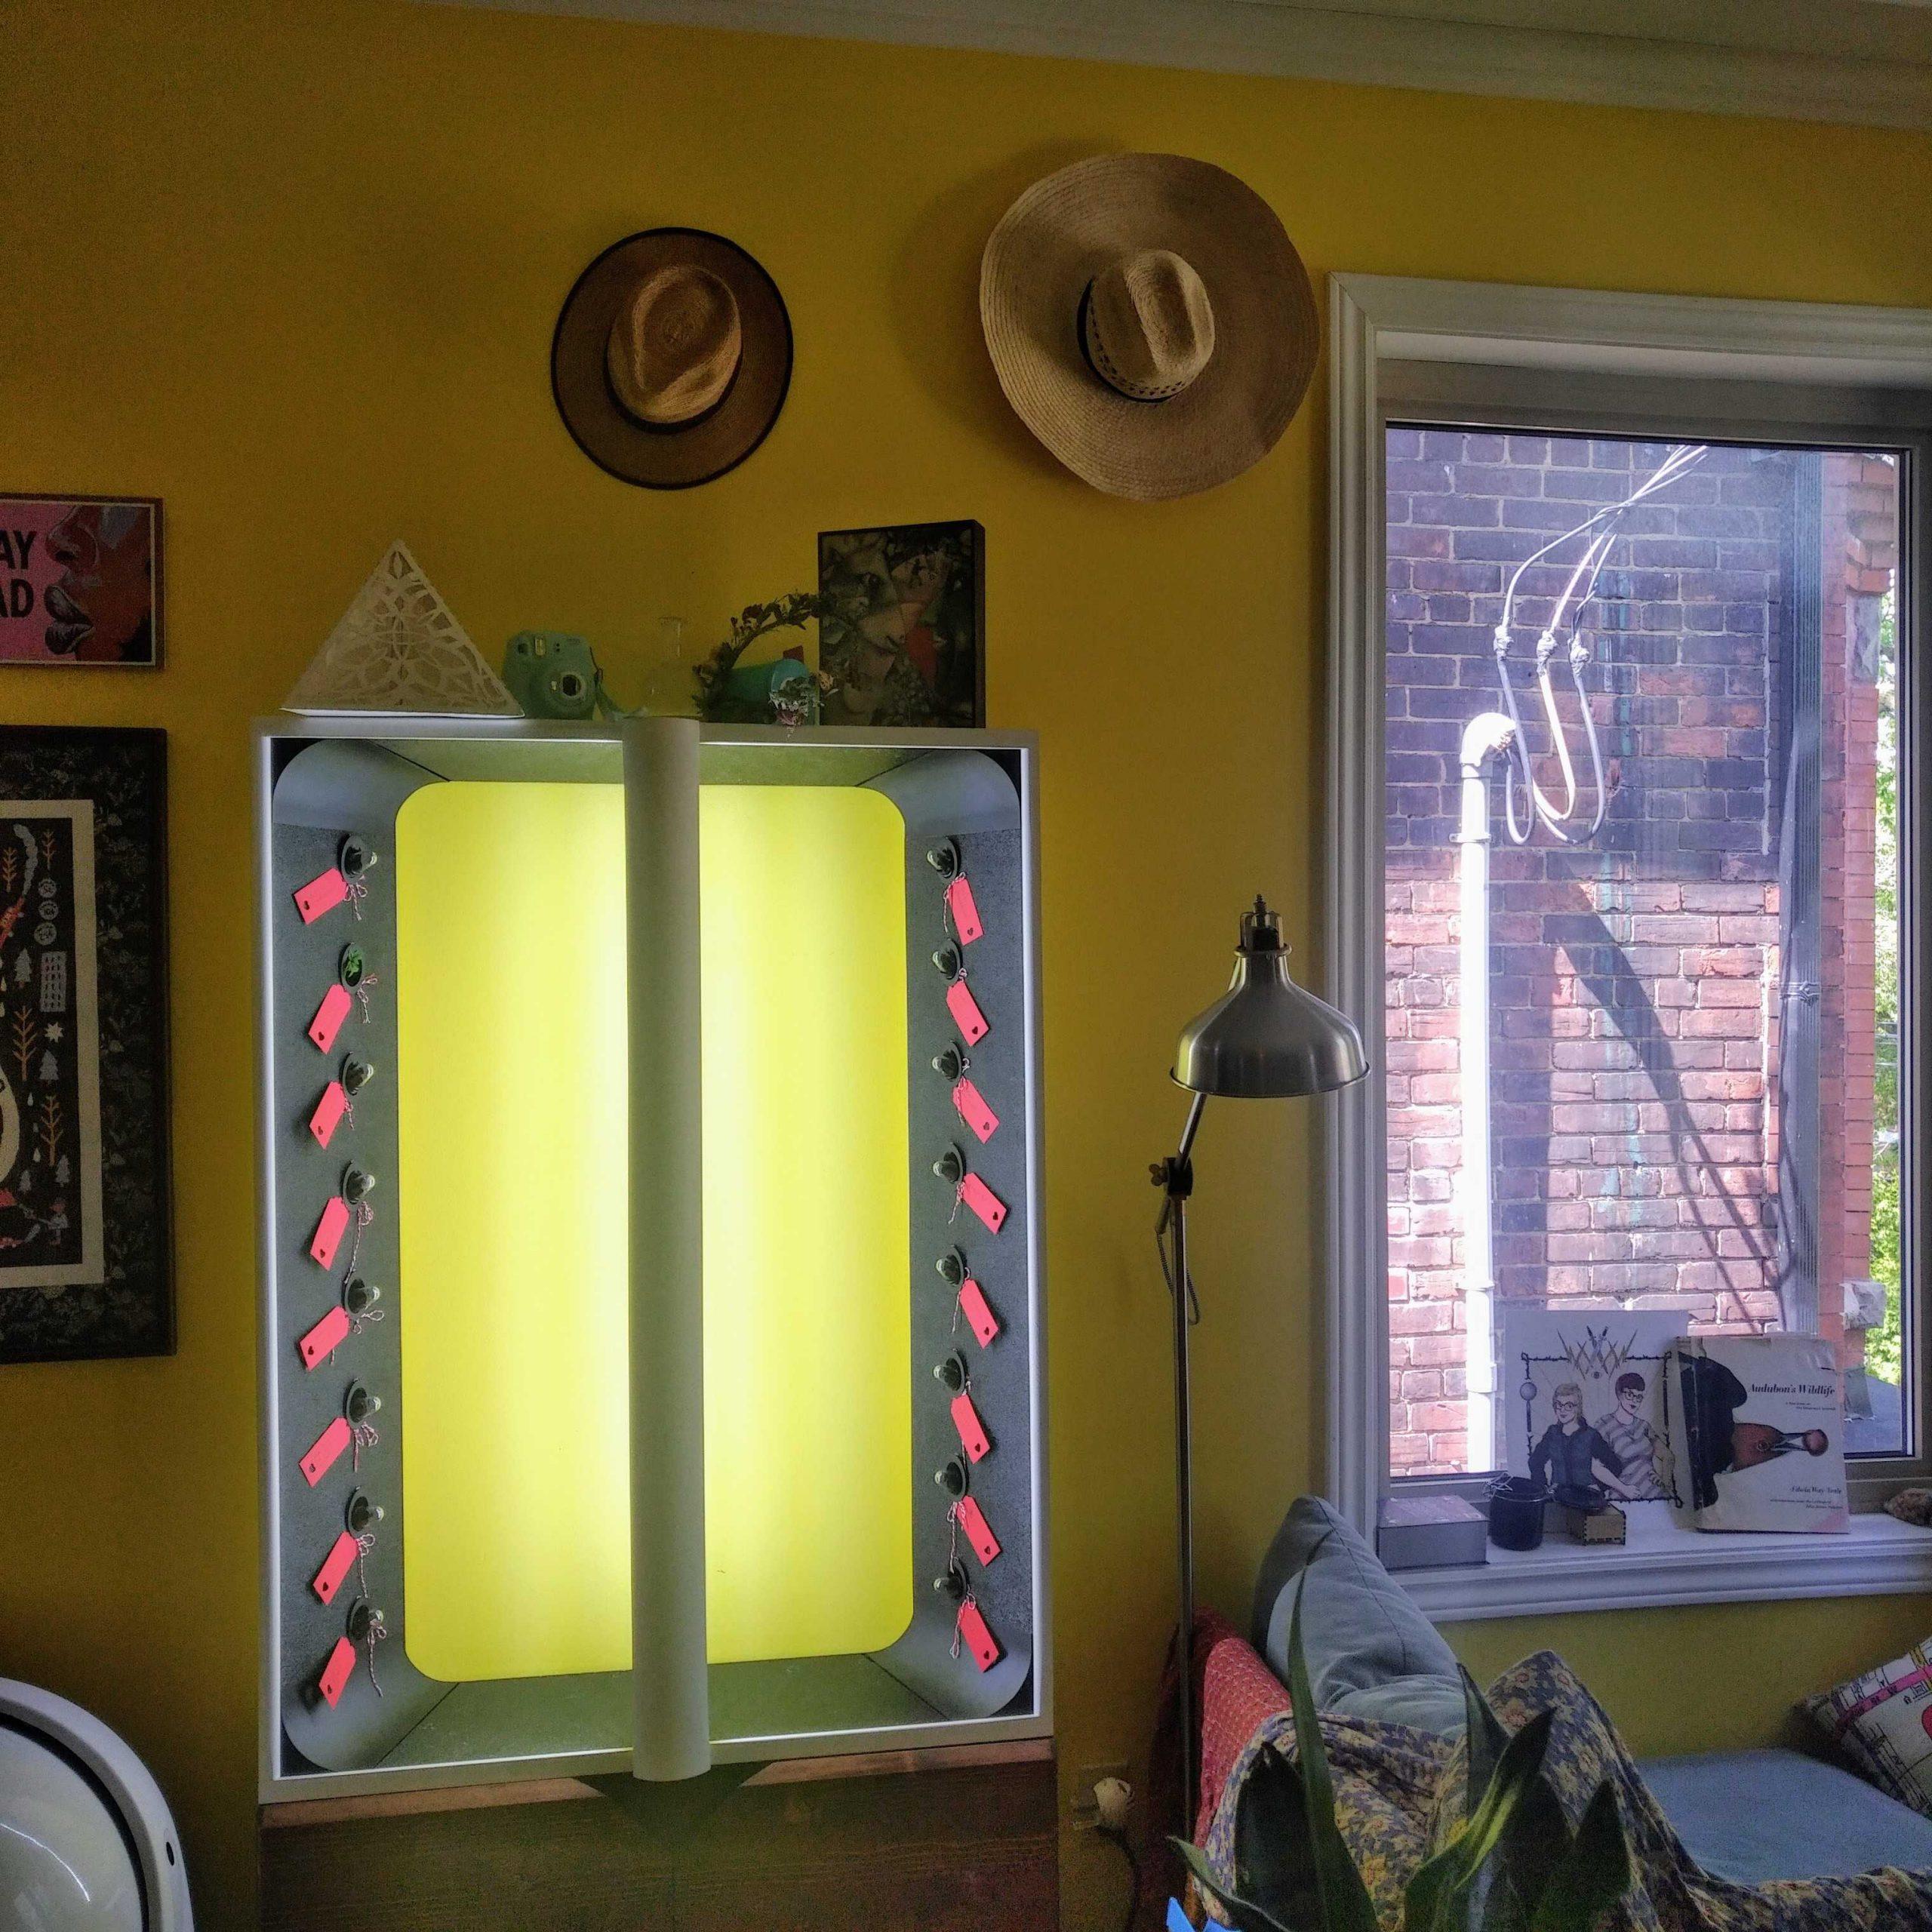 Audra's AEVA unit, a vertical indoor garden.